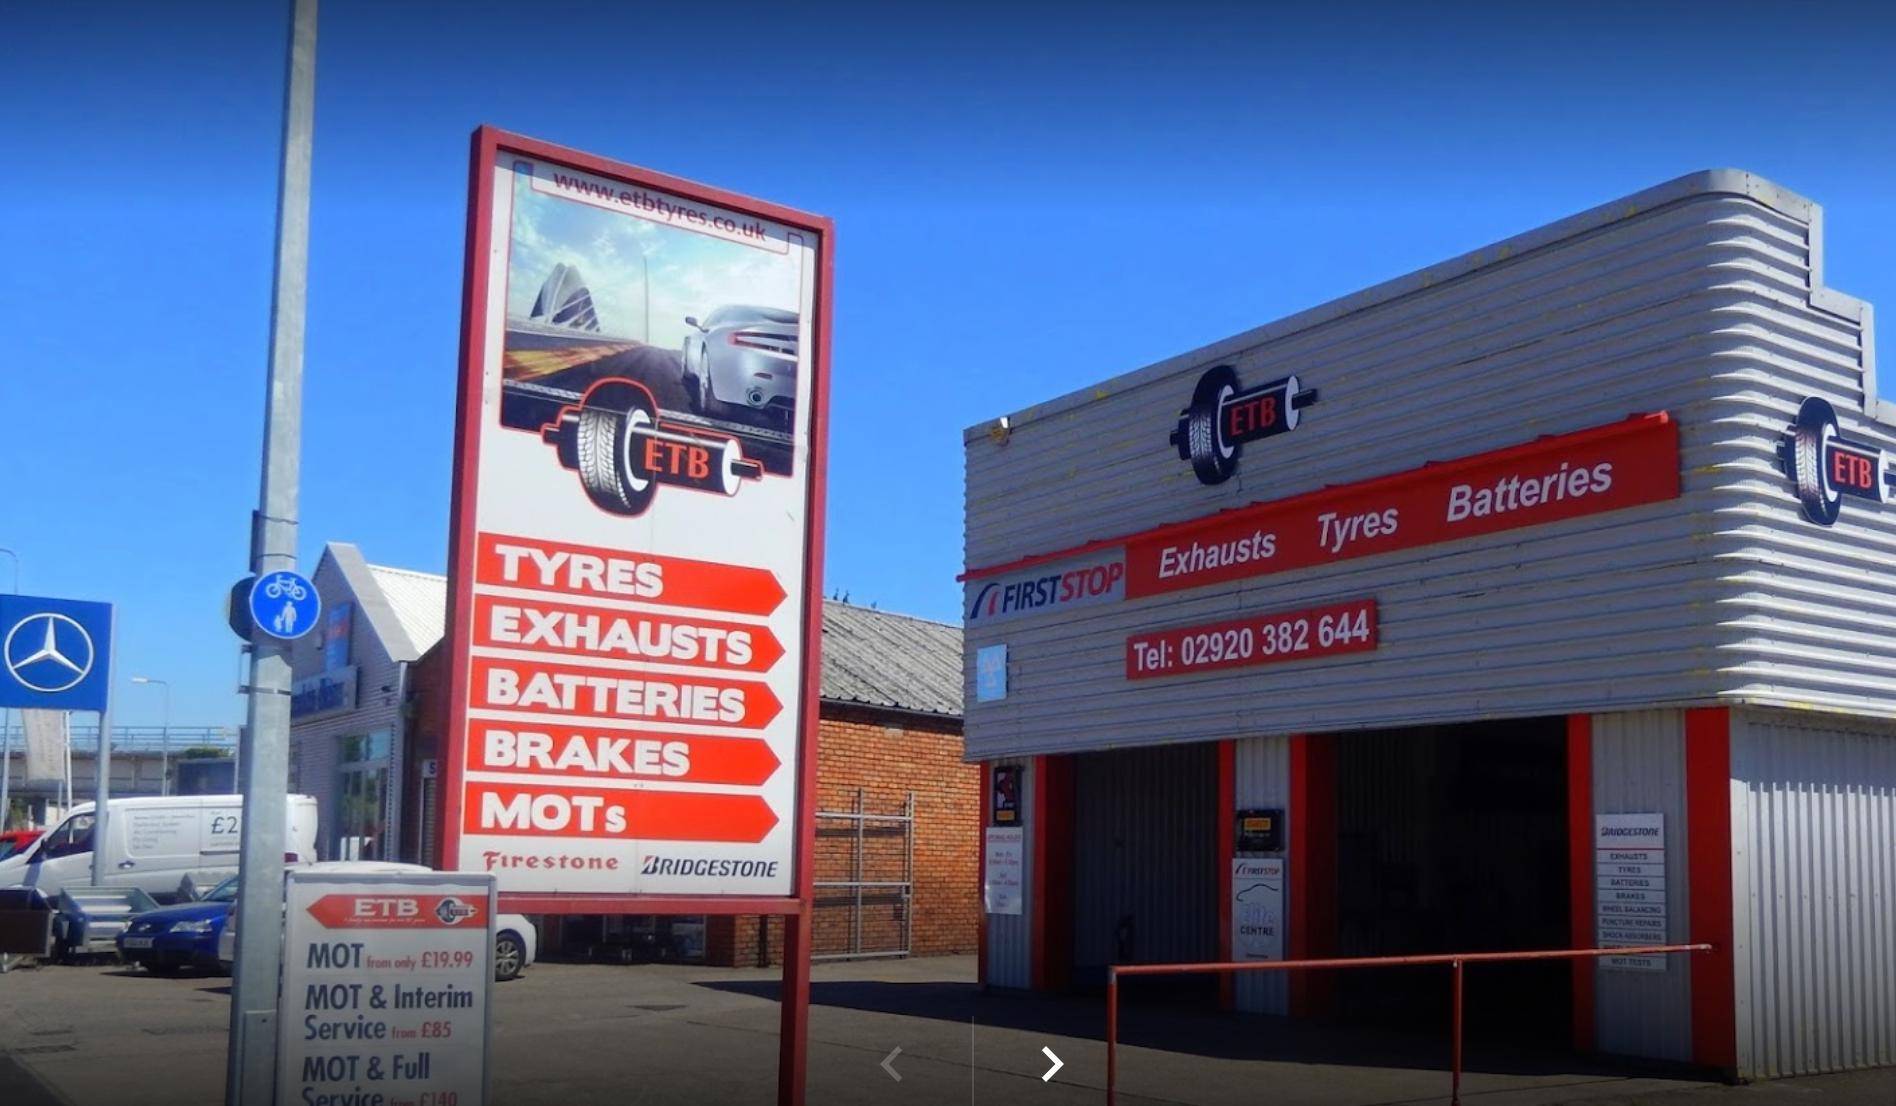 ETB - Exhaust Tyres & Batteries - Cardiff